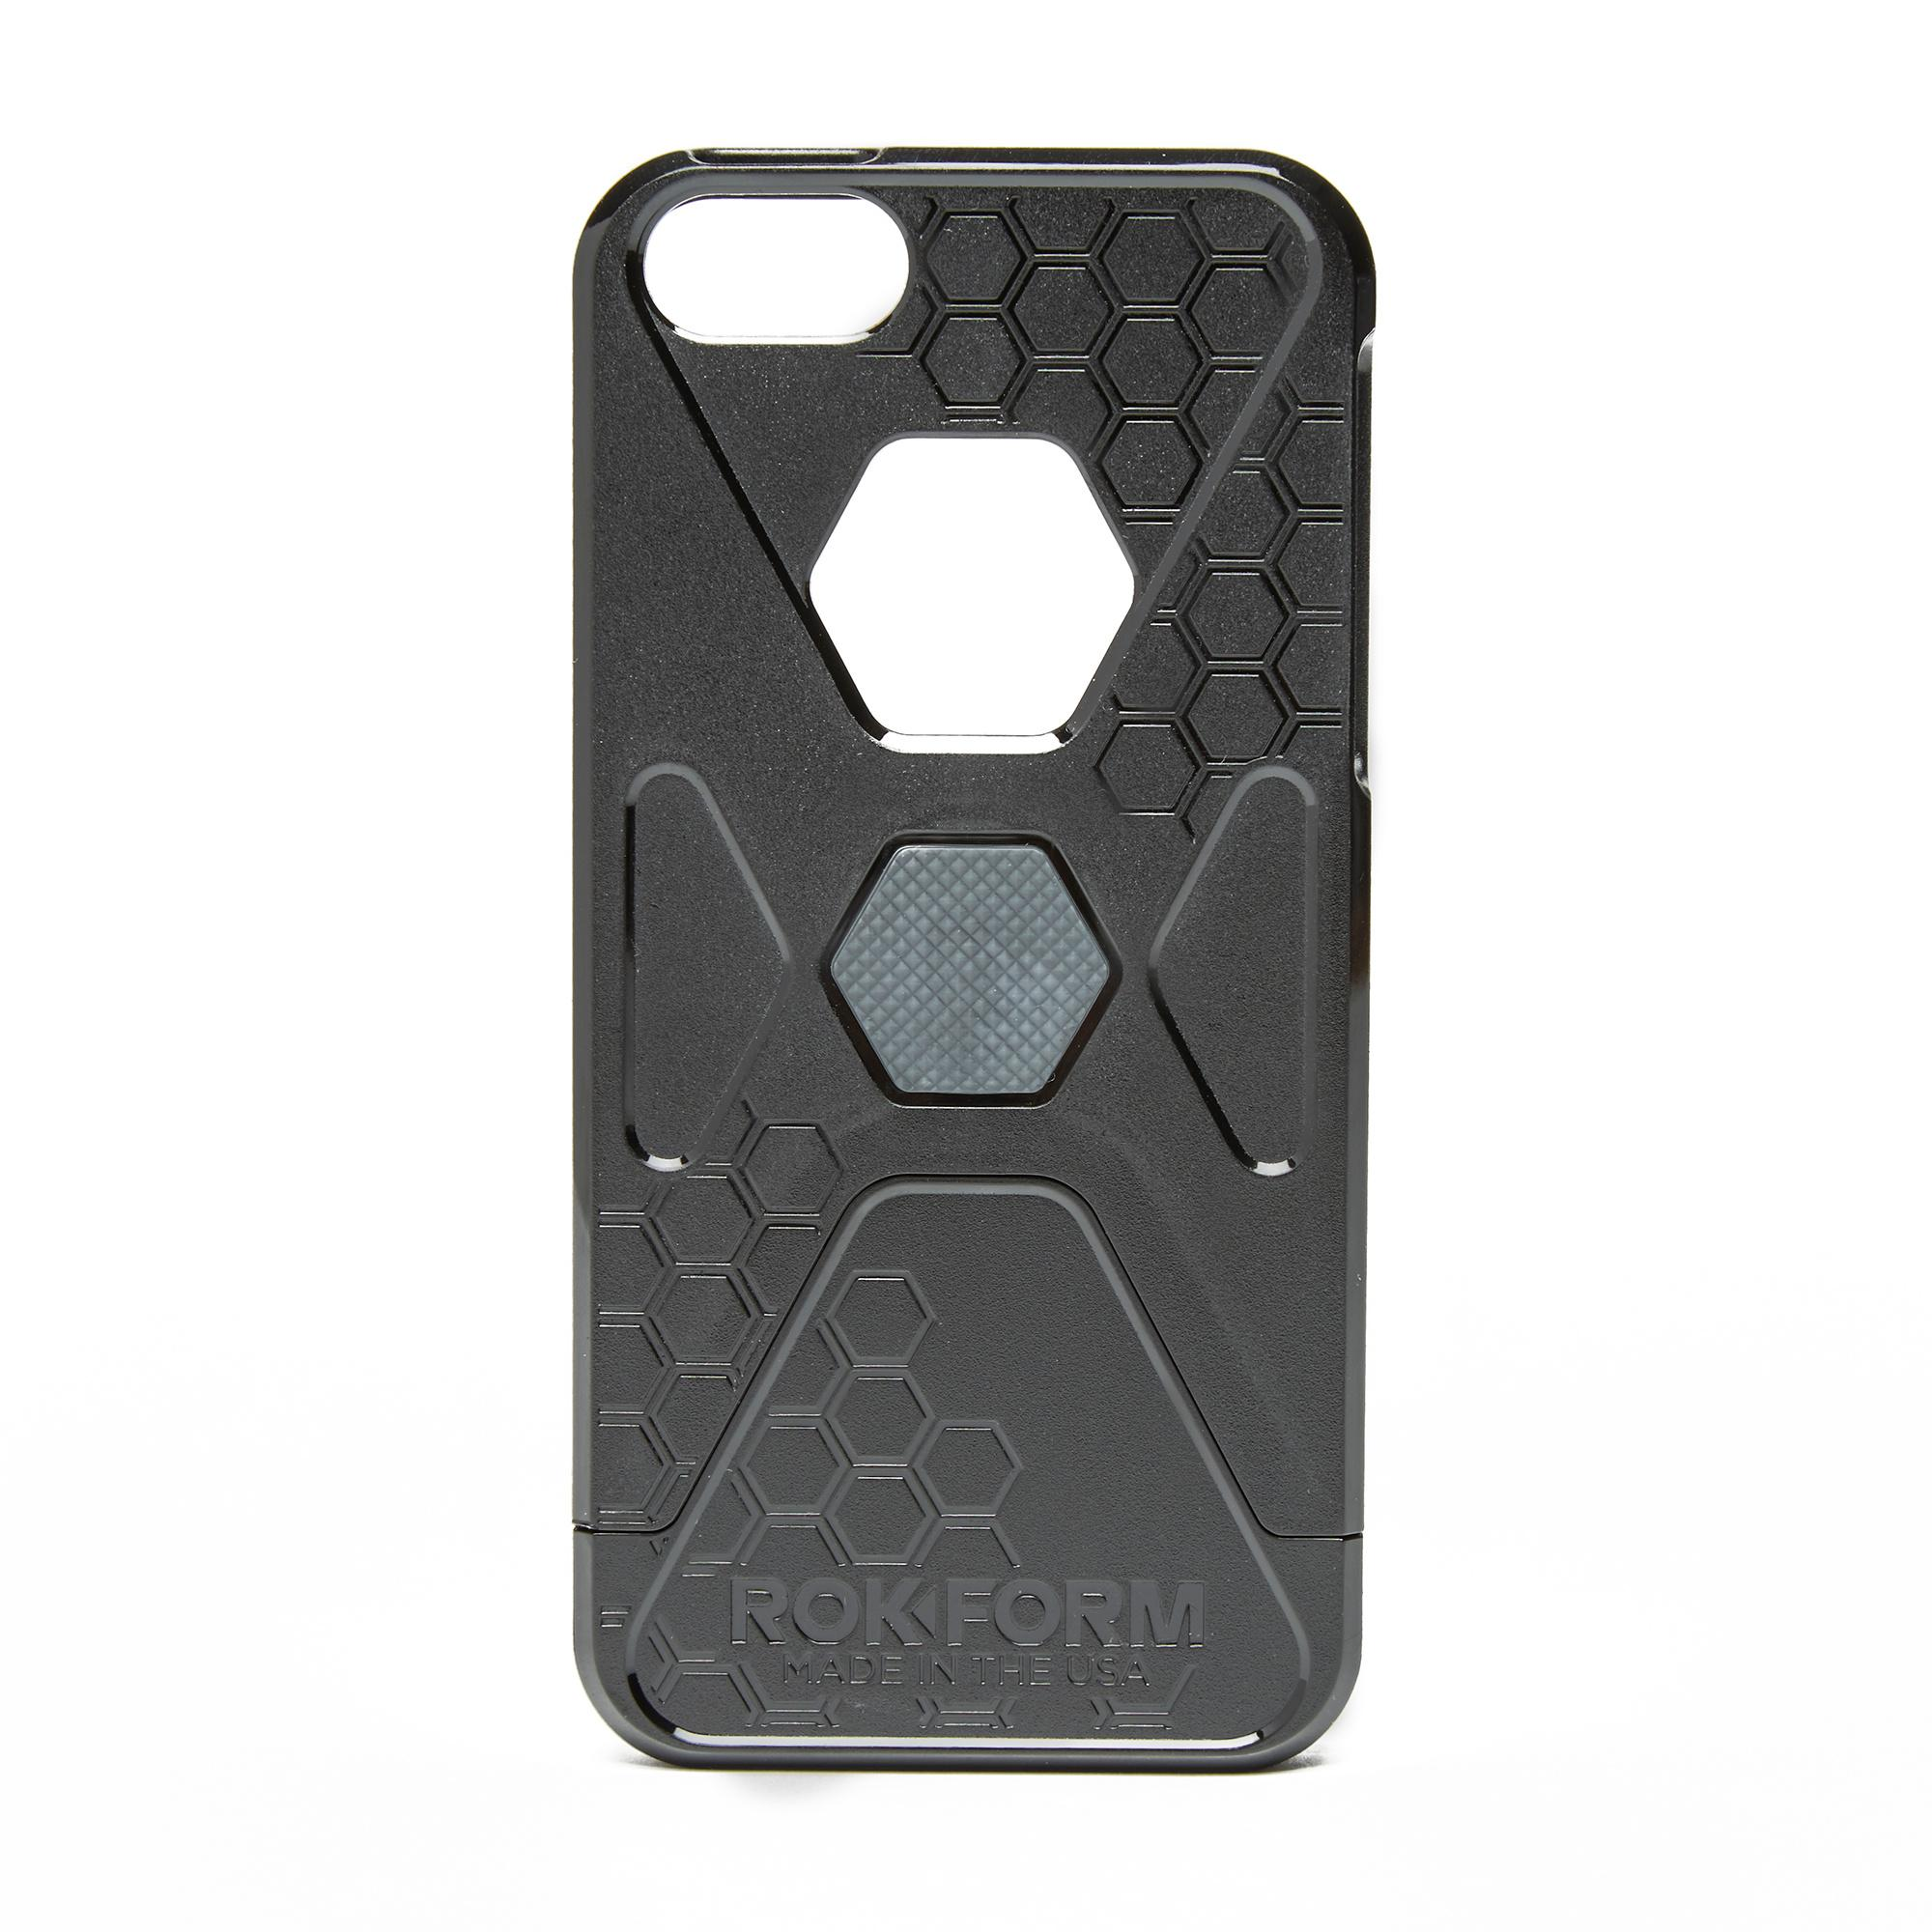 Rokform Rokform iPhone 5 Slim and Sleek Case - Black, Black